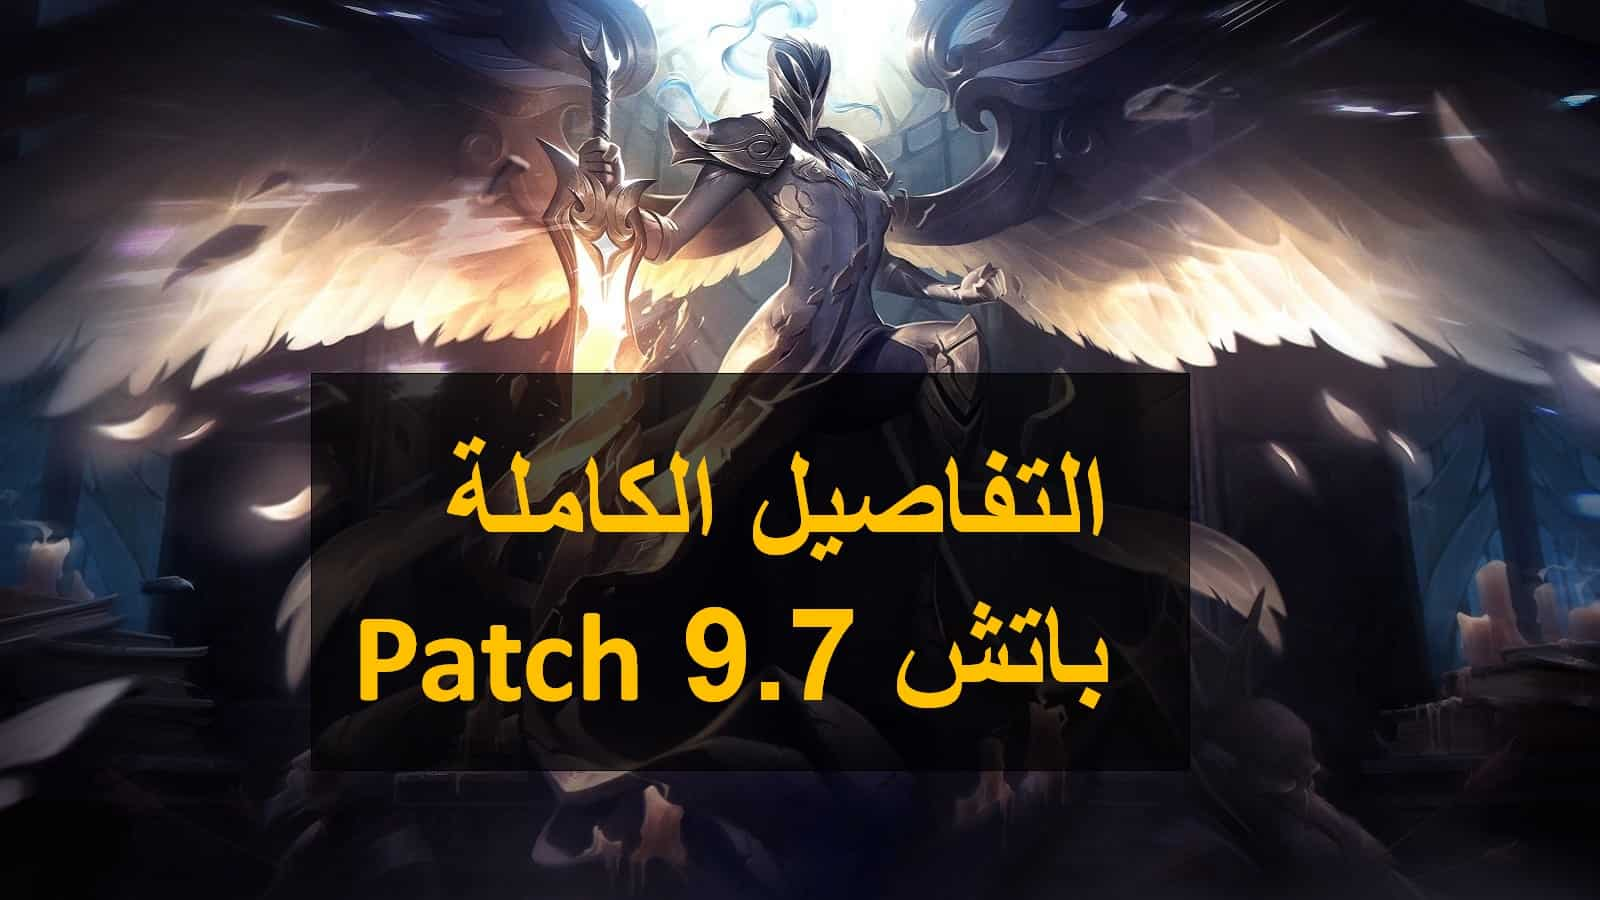 Photo of كل ما نعرفه عن التحديث الجديد Patch 9.7 في League of Legends